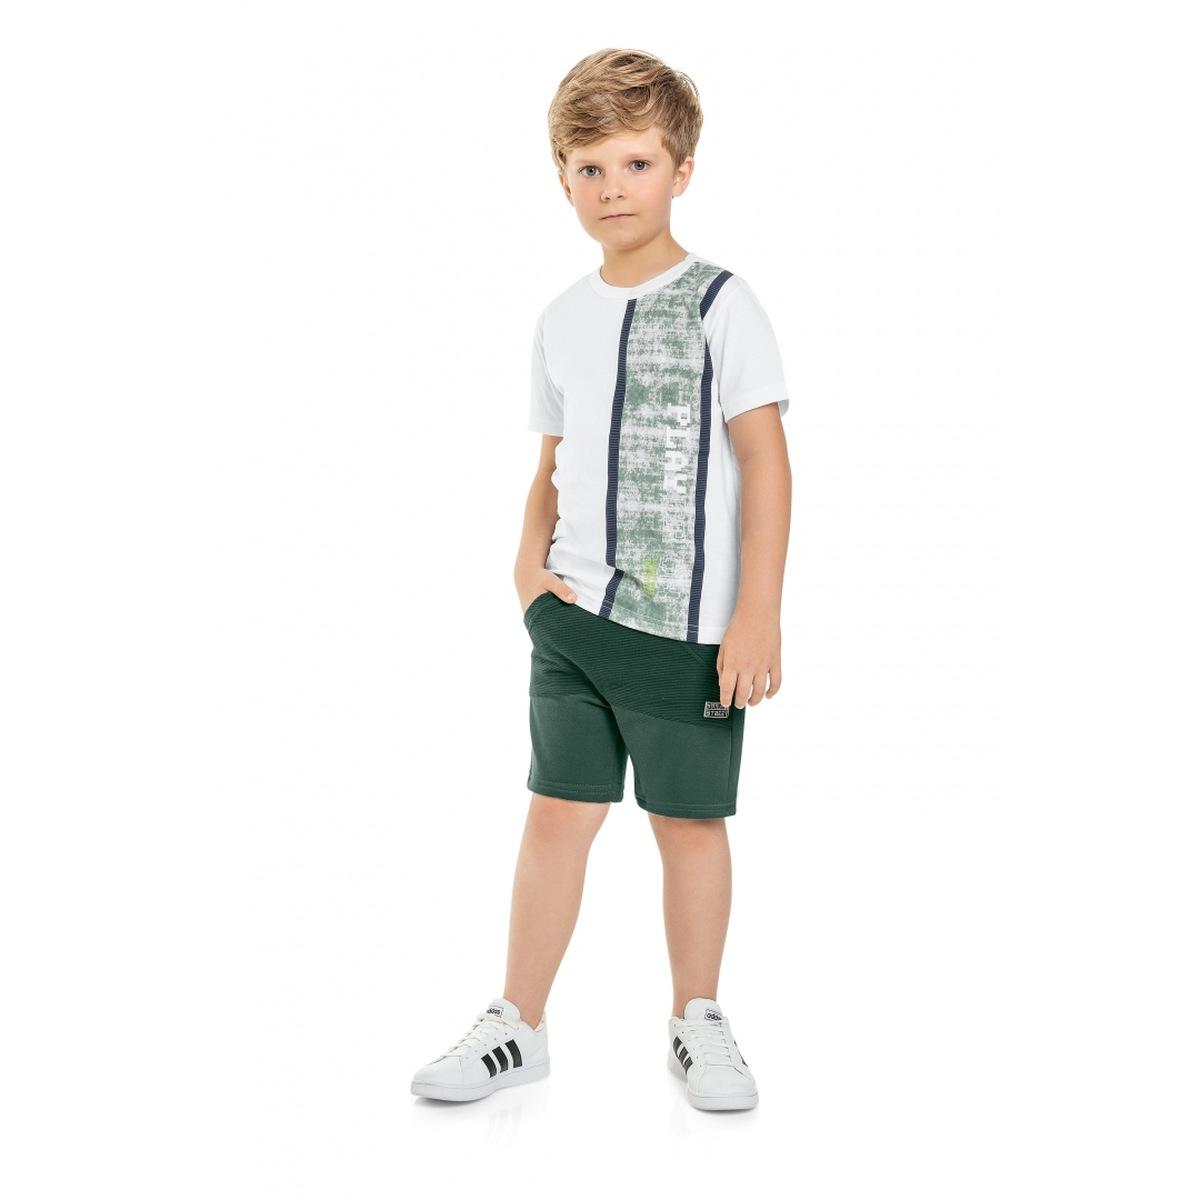 Conjunto Menino Quimby Camiseta e Bermuda - Branco